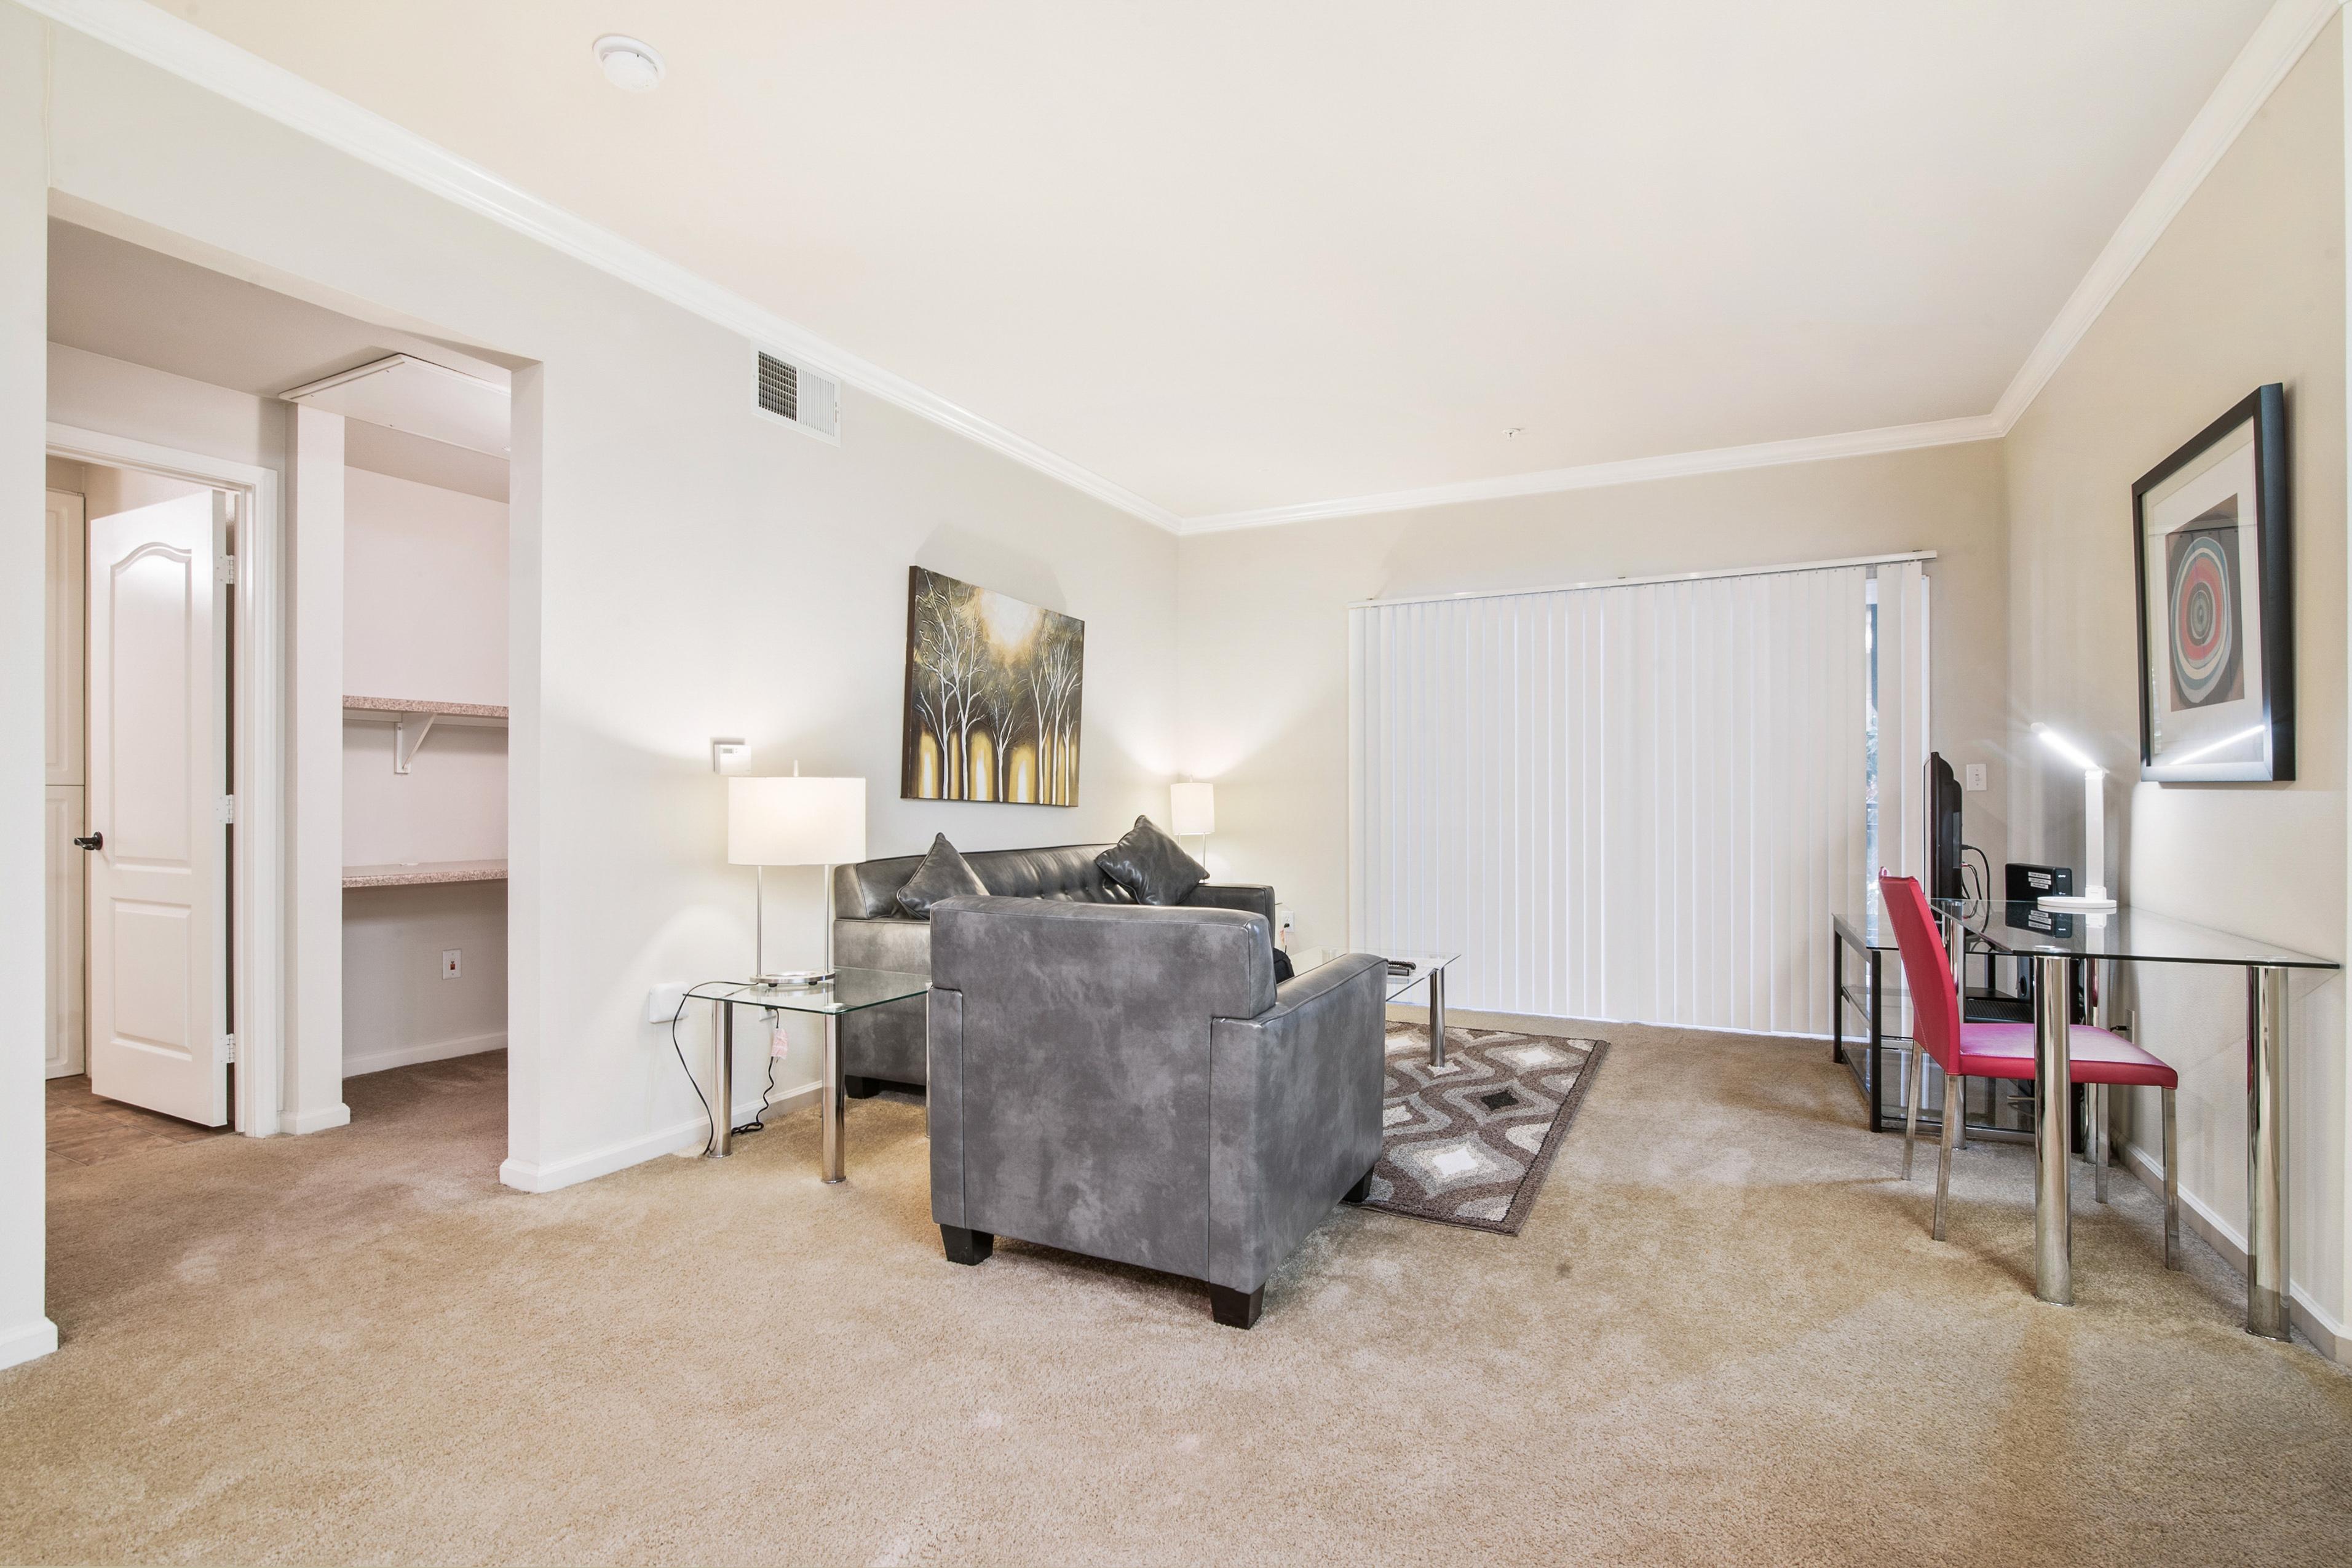 image 3 furnished 2 bedroom Apartment for rent in Santa Clara, Santa Clara County